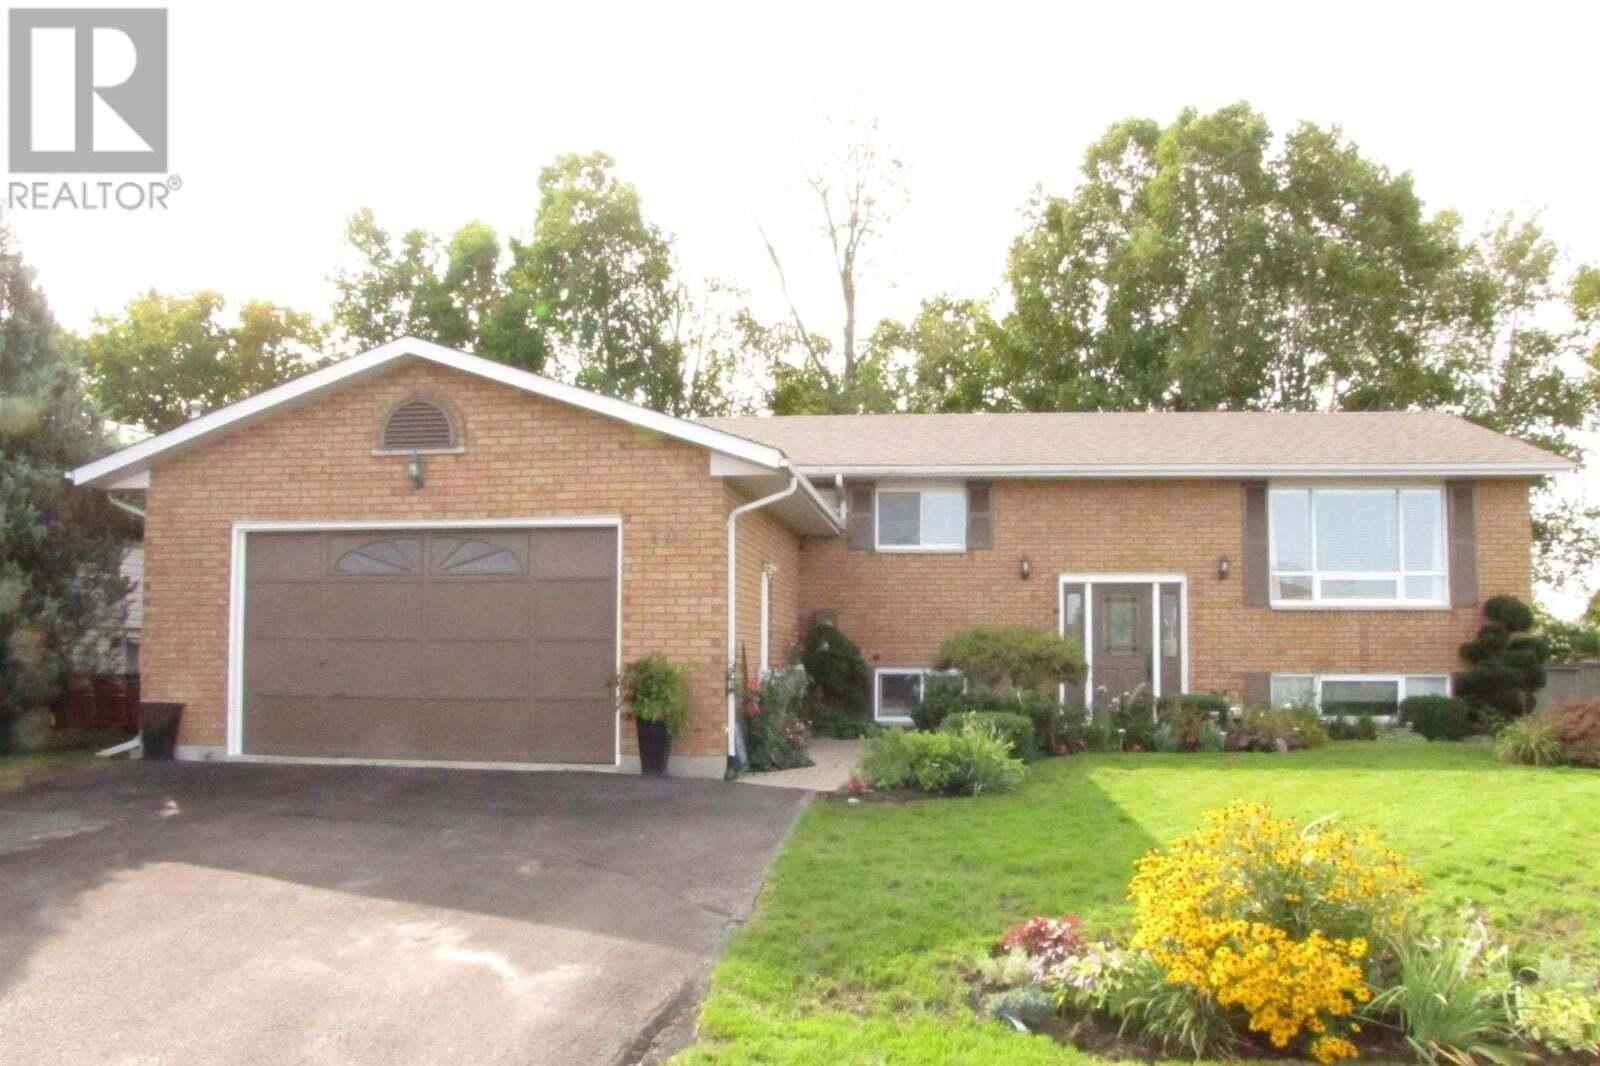 House for sale at 103 Raglan St E Brighton Ontario - MLS: K20005440